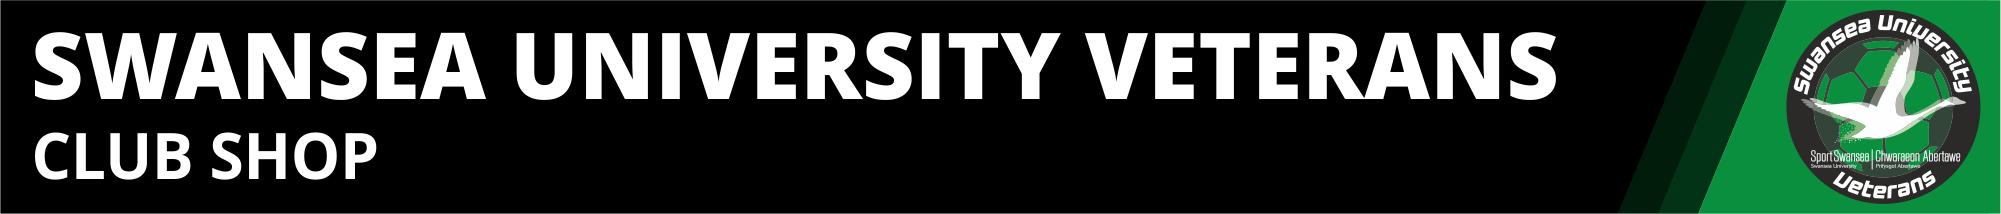 swansea-university-veterans-club-shop-banner.png